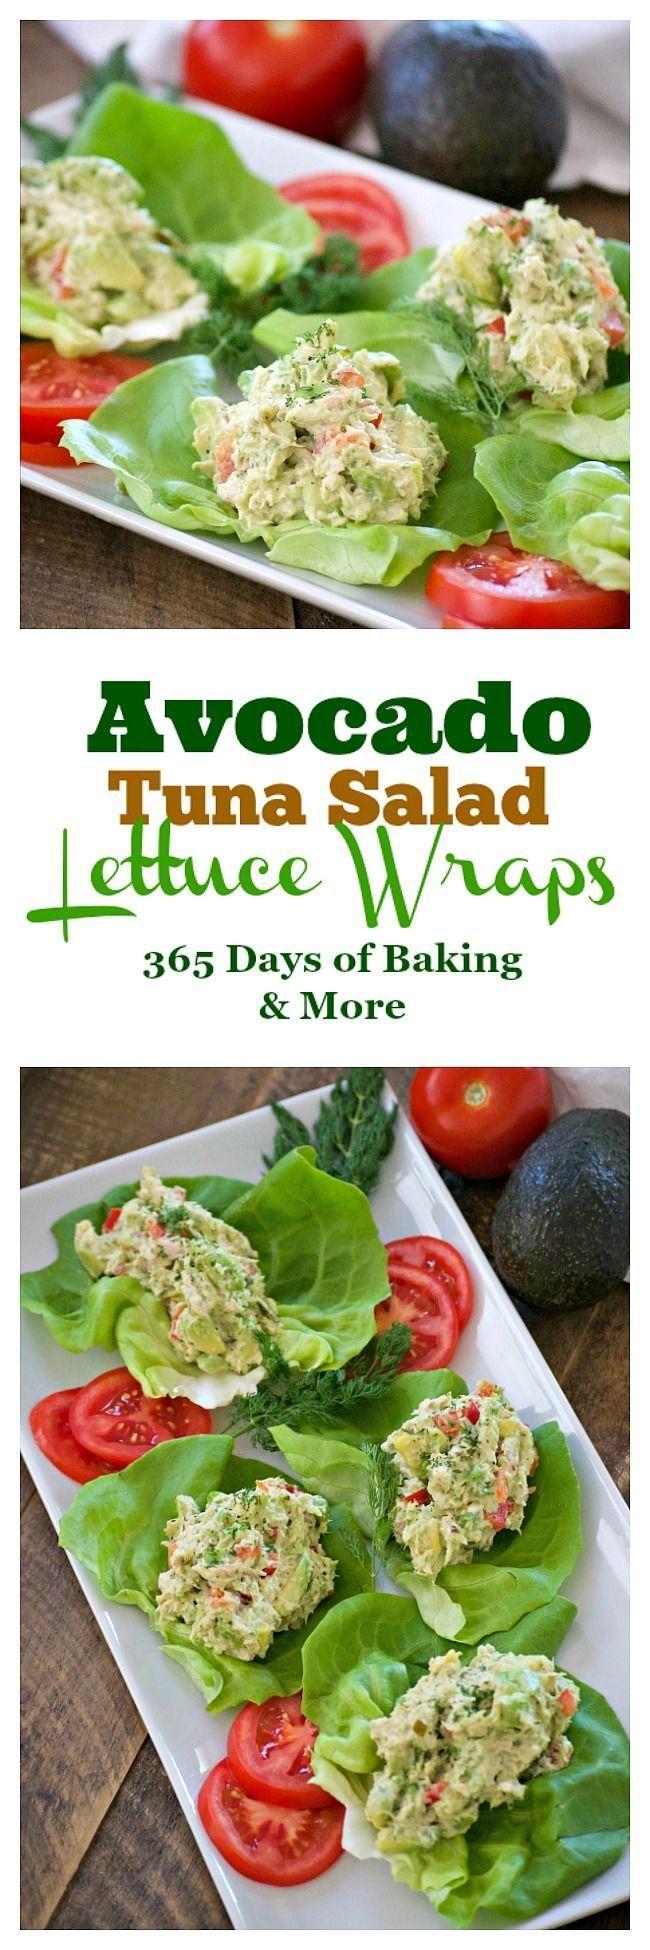 White apron dc nutrition - Avocado Tuna Salad Lettuce Wraps